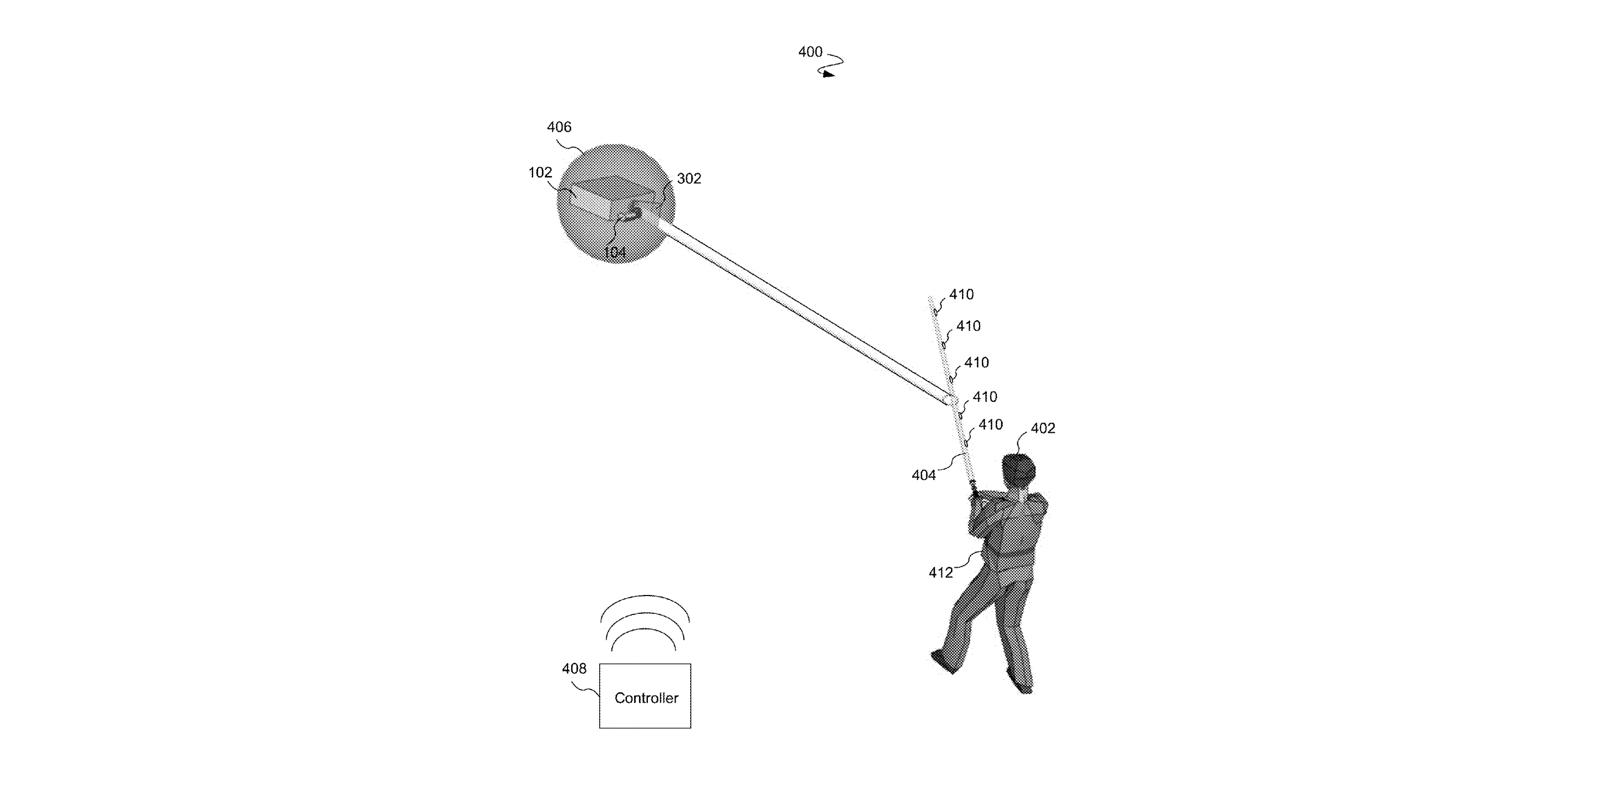 disney-lightsaber-patent